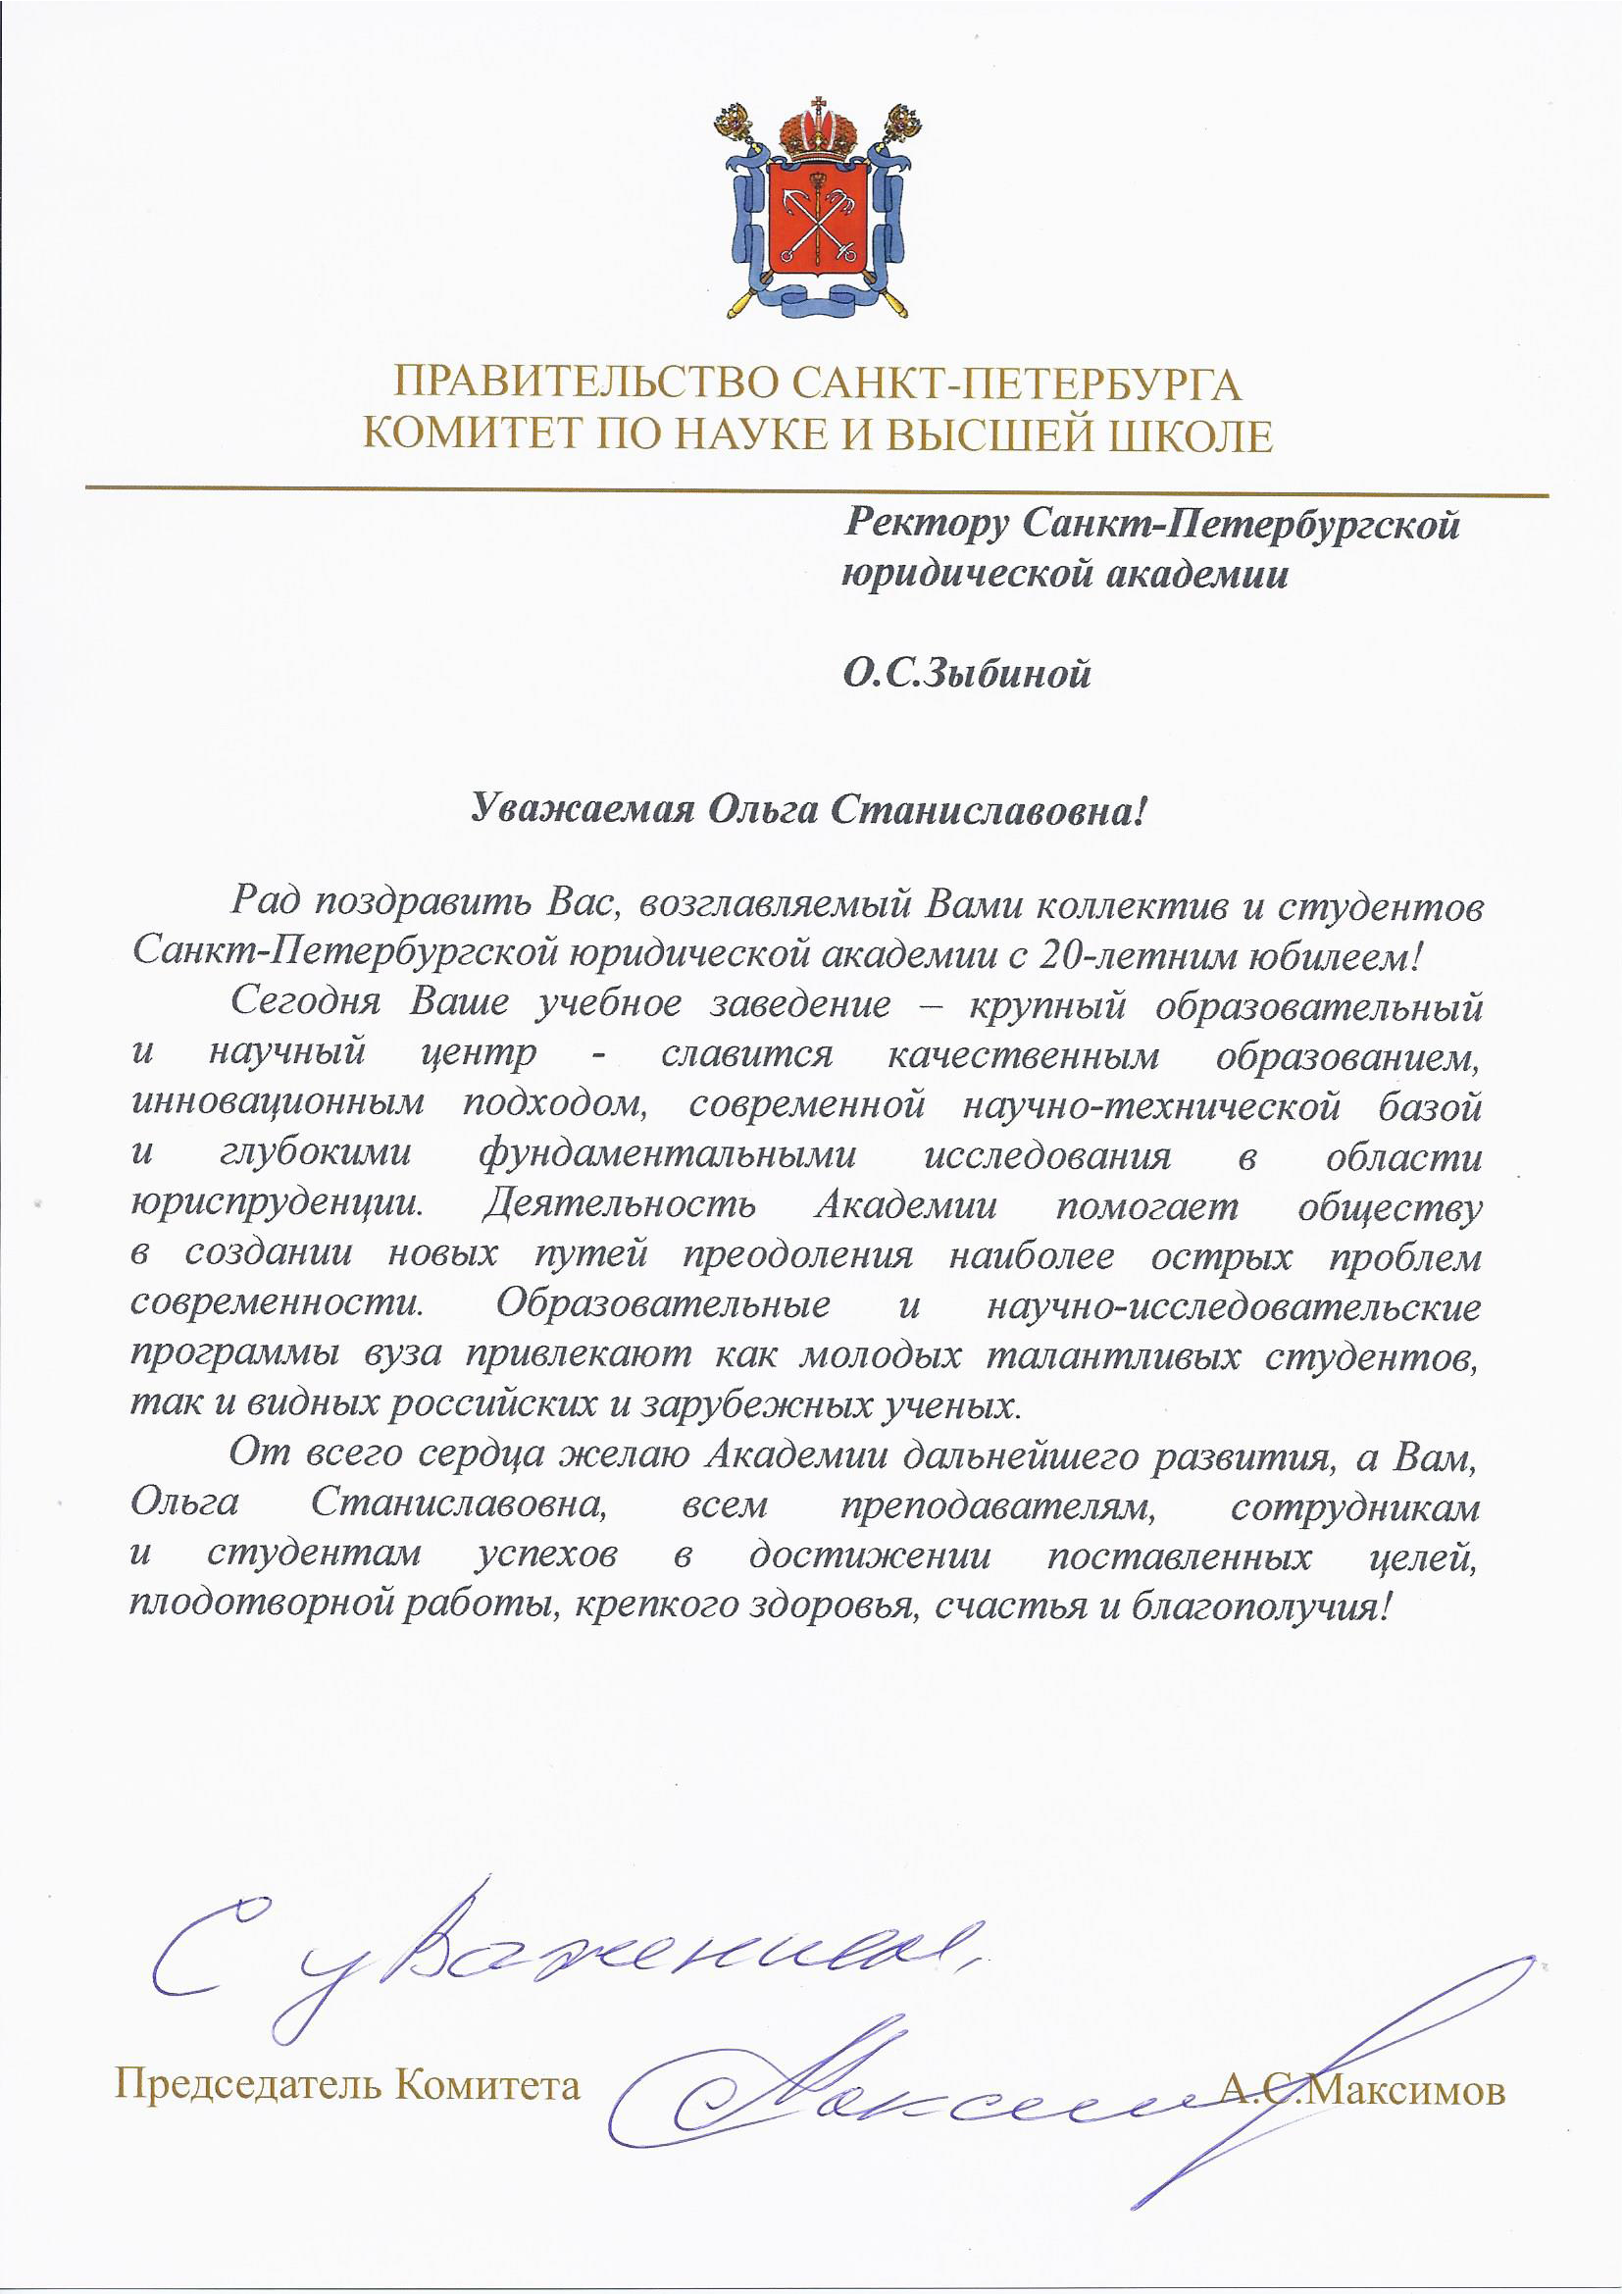 враг поздравление председателю комитета по науке красивой